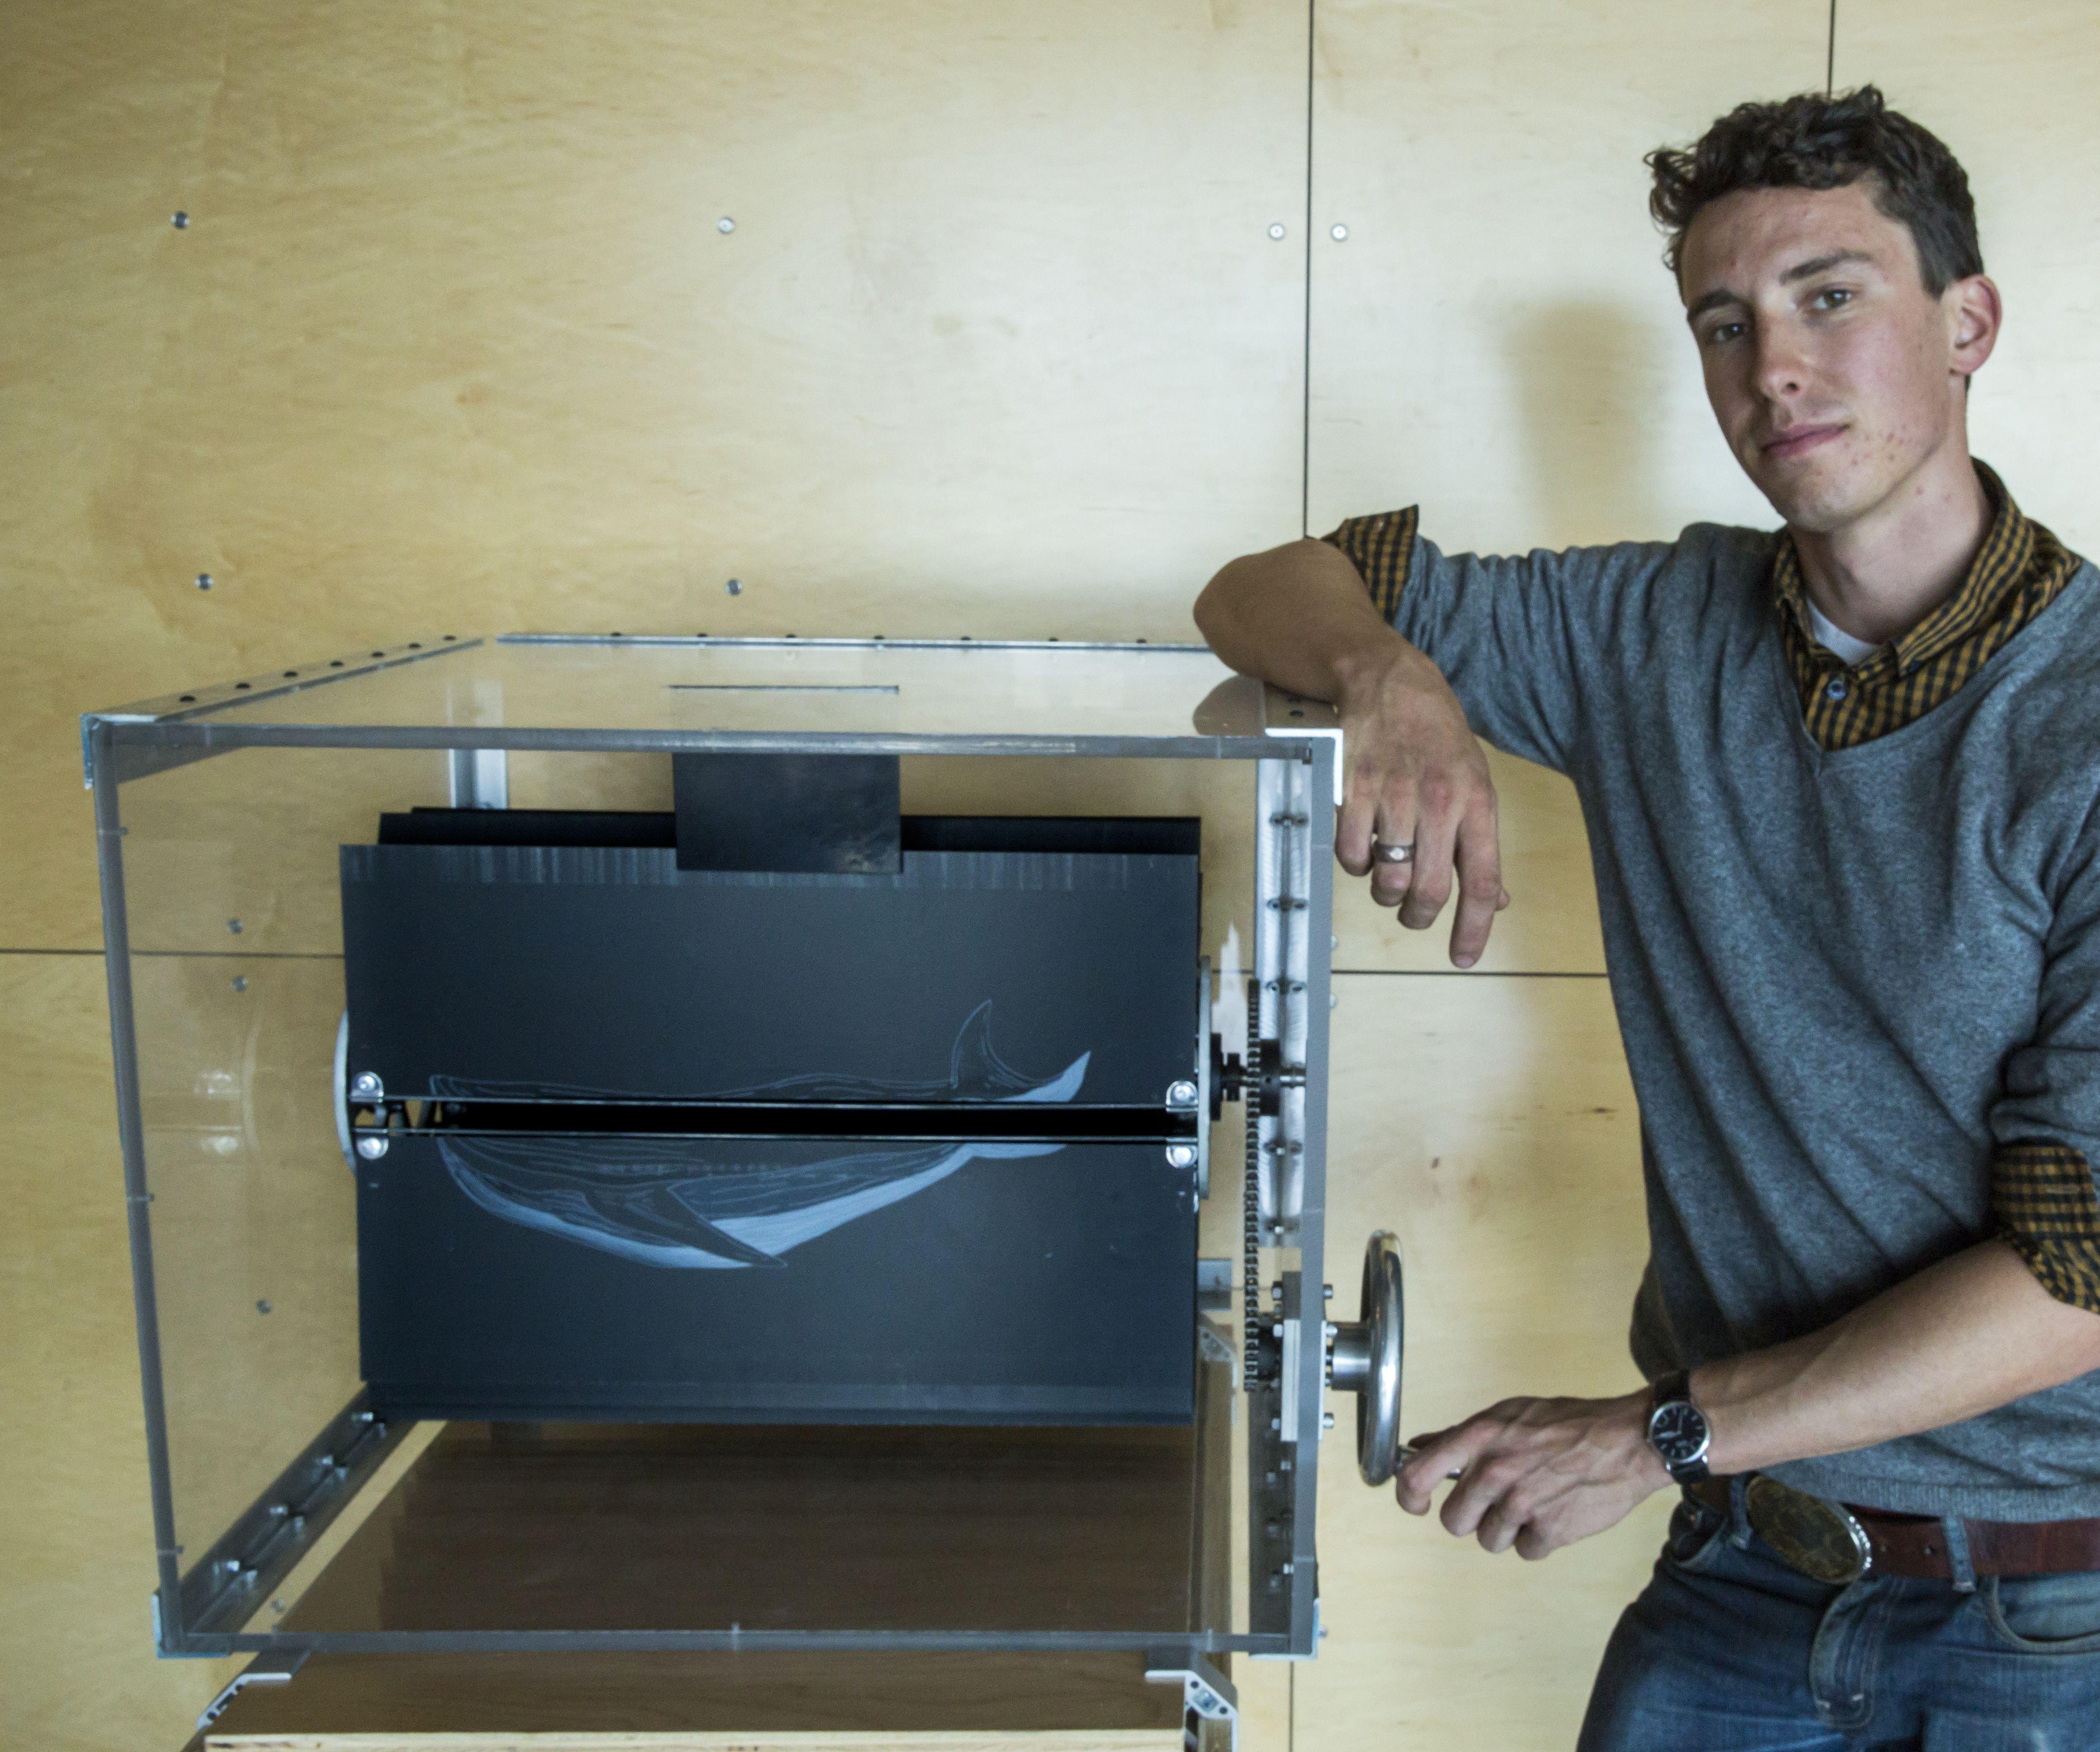 The World's Largest Mechanical Flipbook